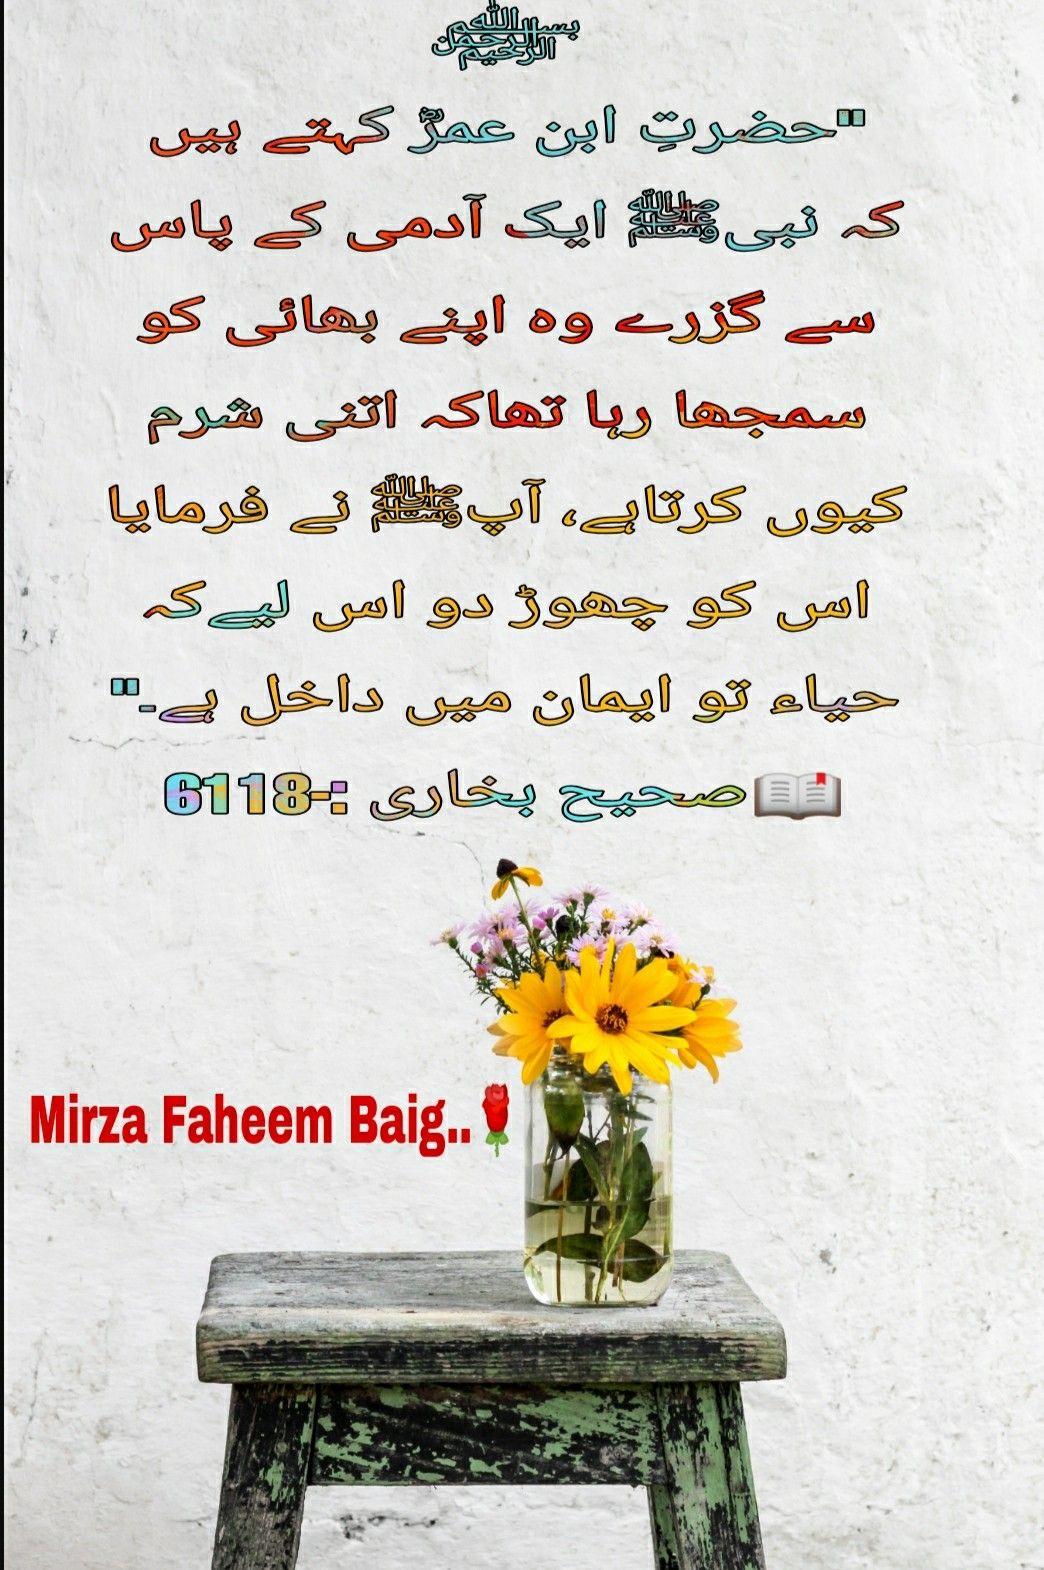 Pin By Mirza Faheem Baig On قرآن و سنت Bullet Journal Journal